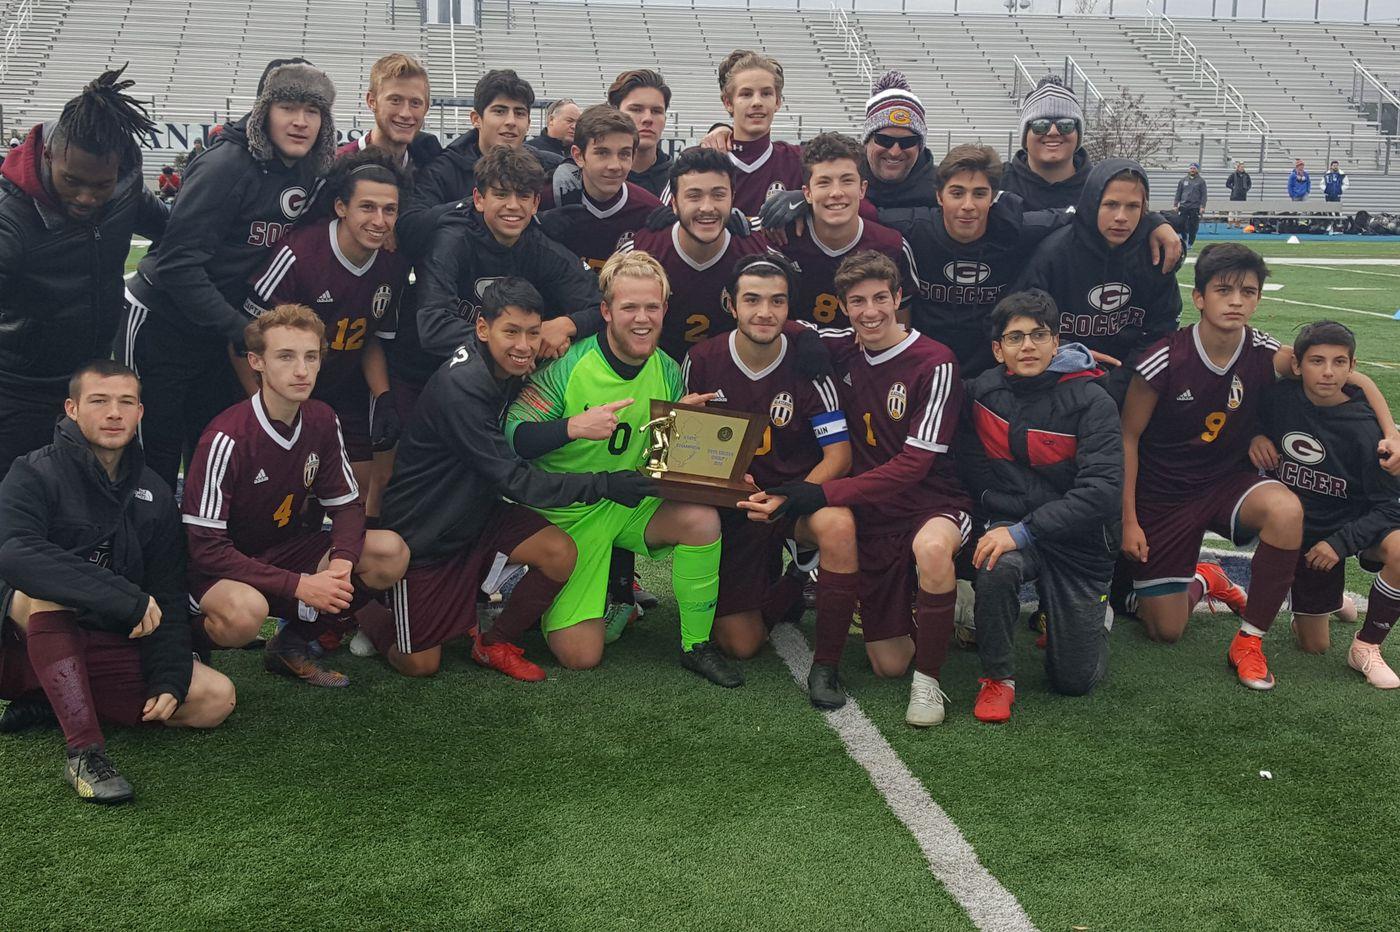 Glassboro wins Group 1 boys' soccer championship in penalty kicks